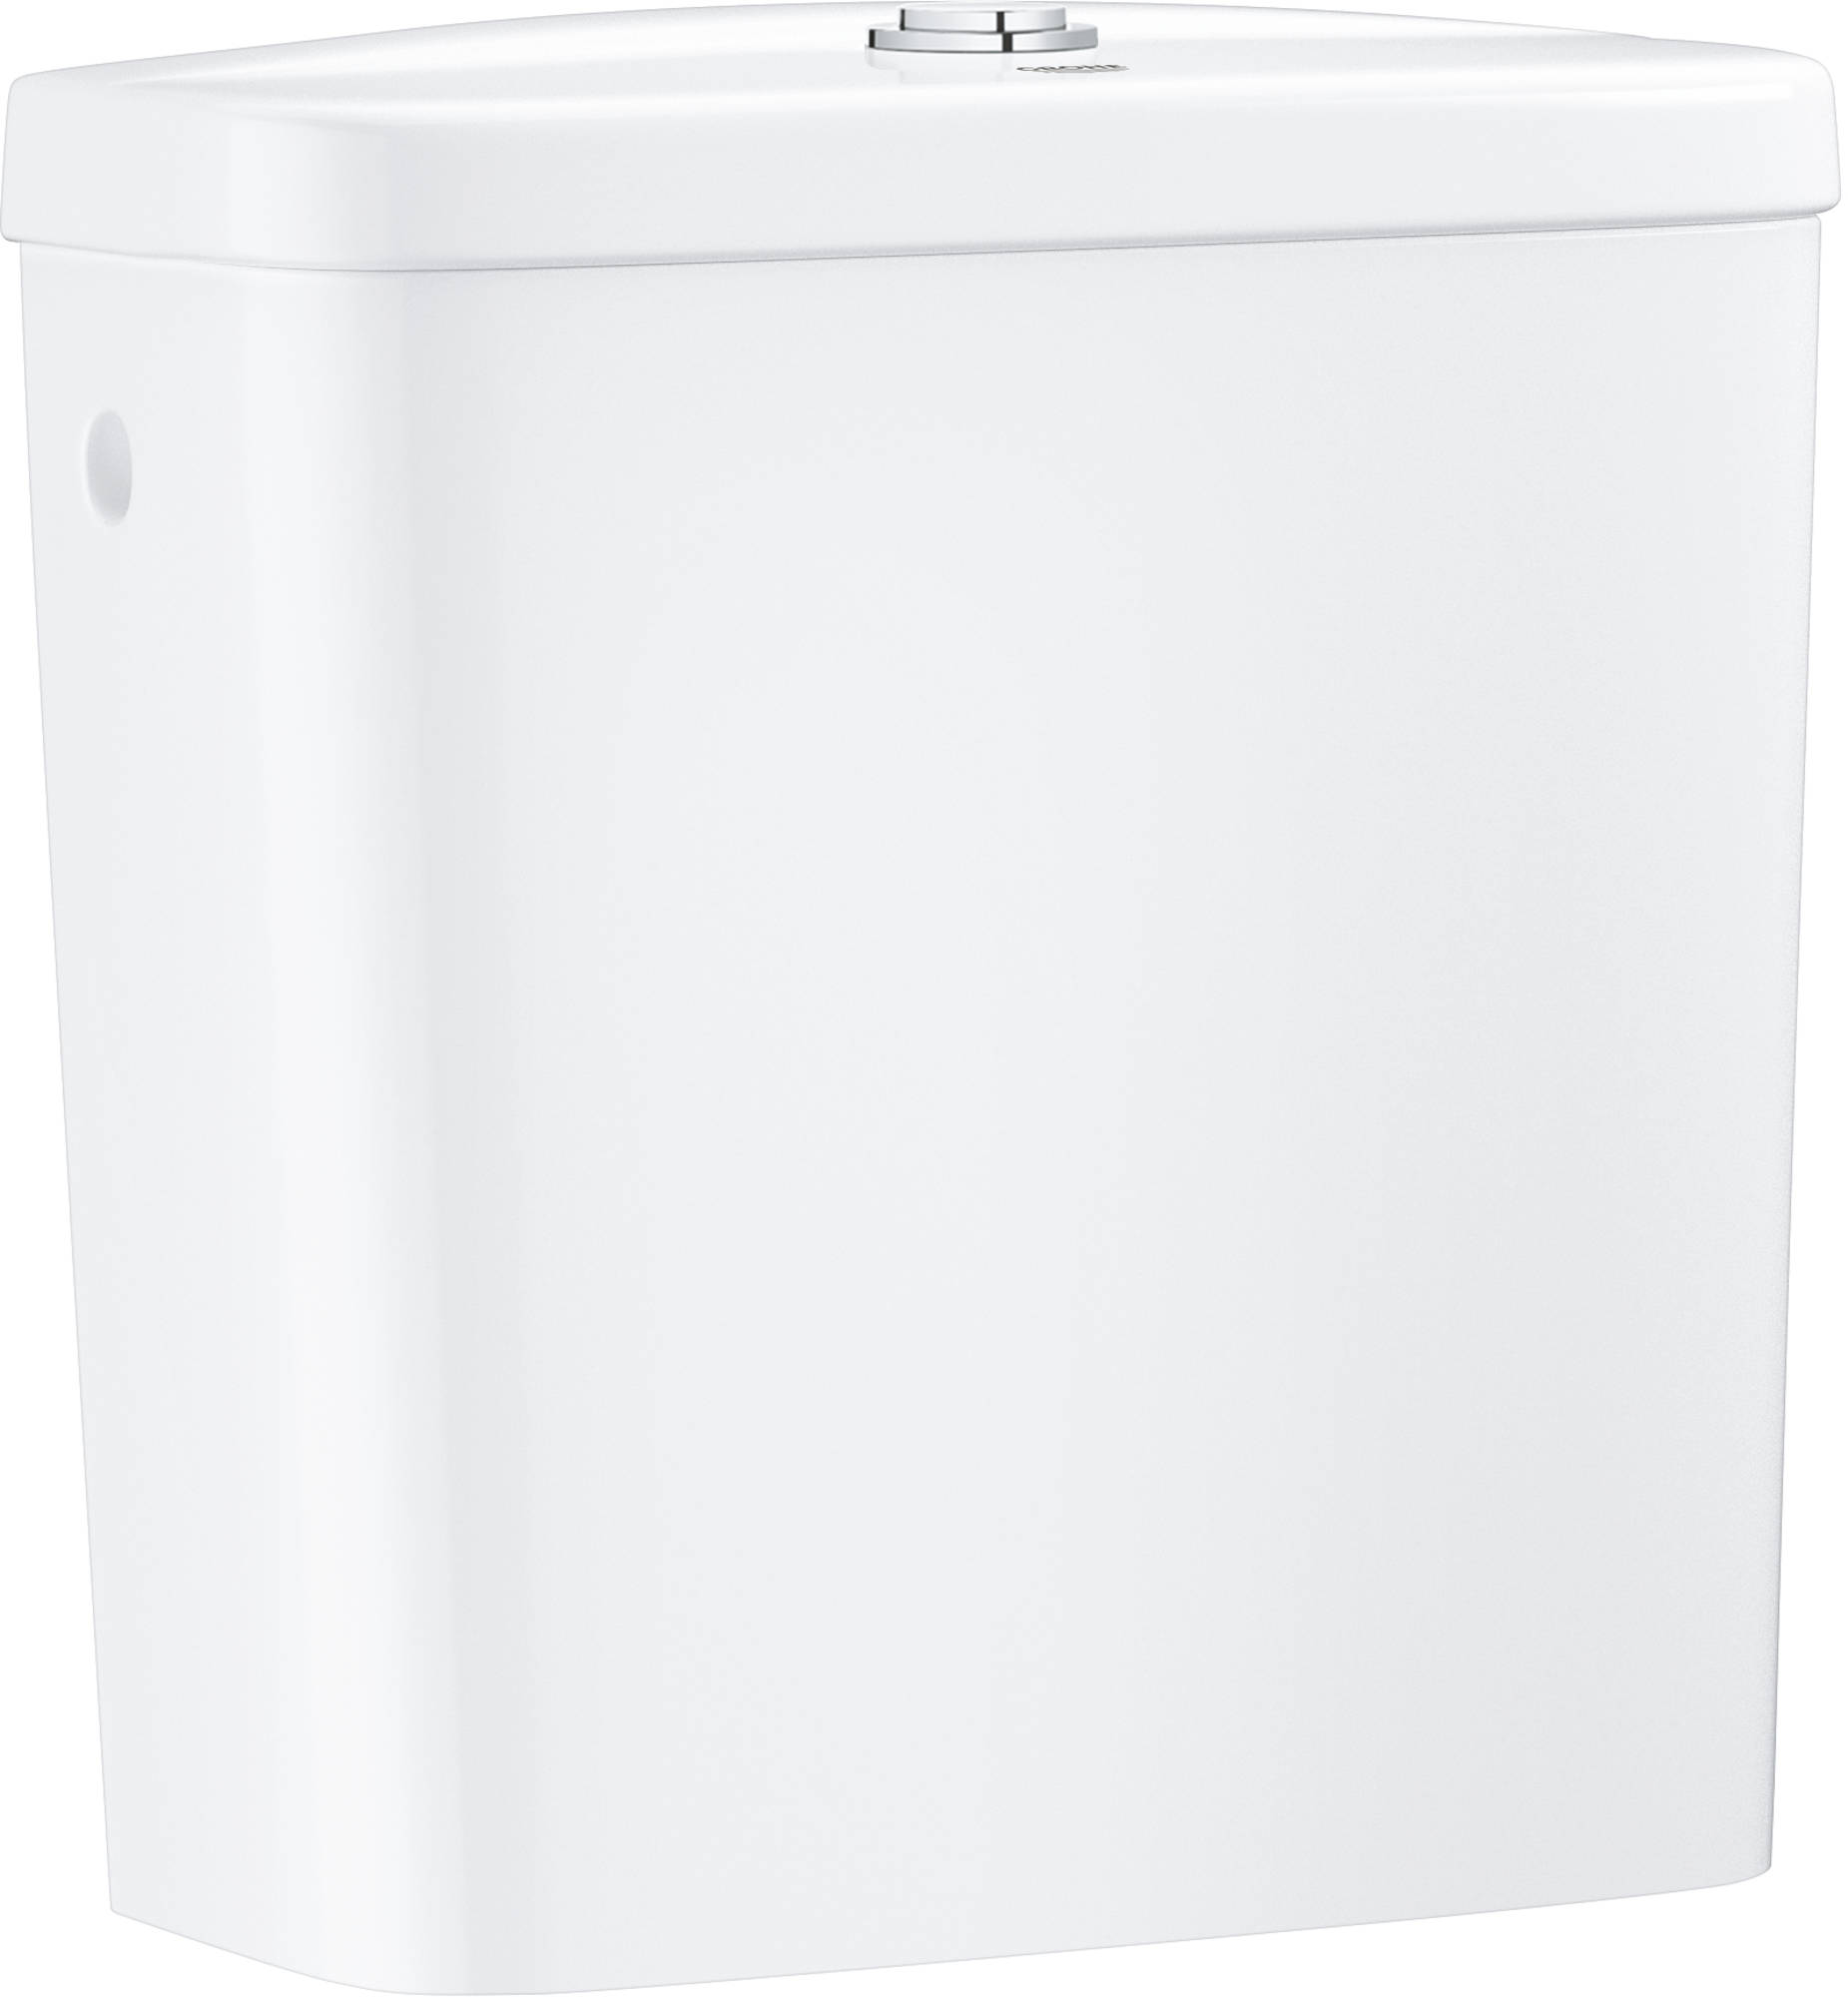 GROHE Bau Ceramic staande wc, zonder spoelrand, glanzend keramiek, Alpine Wit, horizontale afvoer